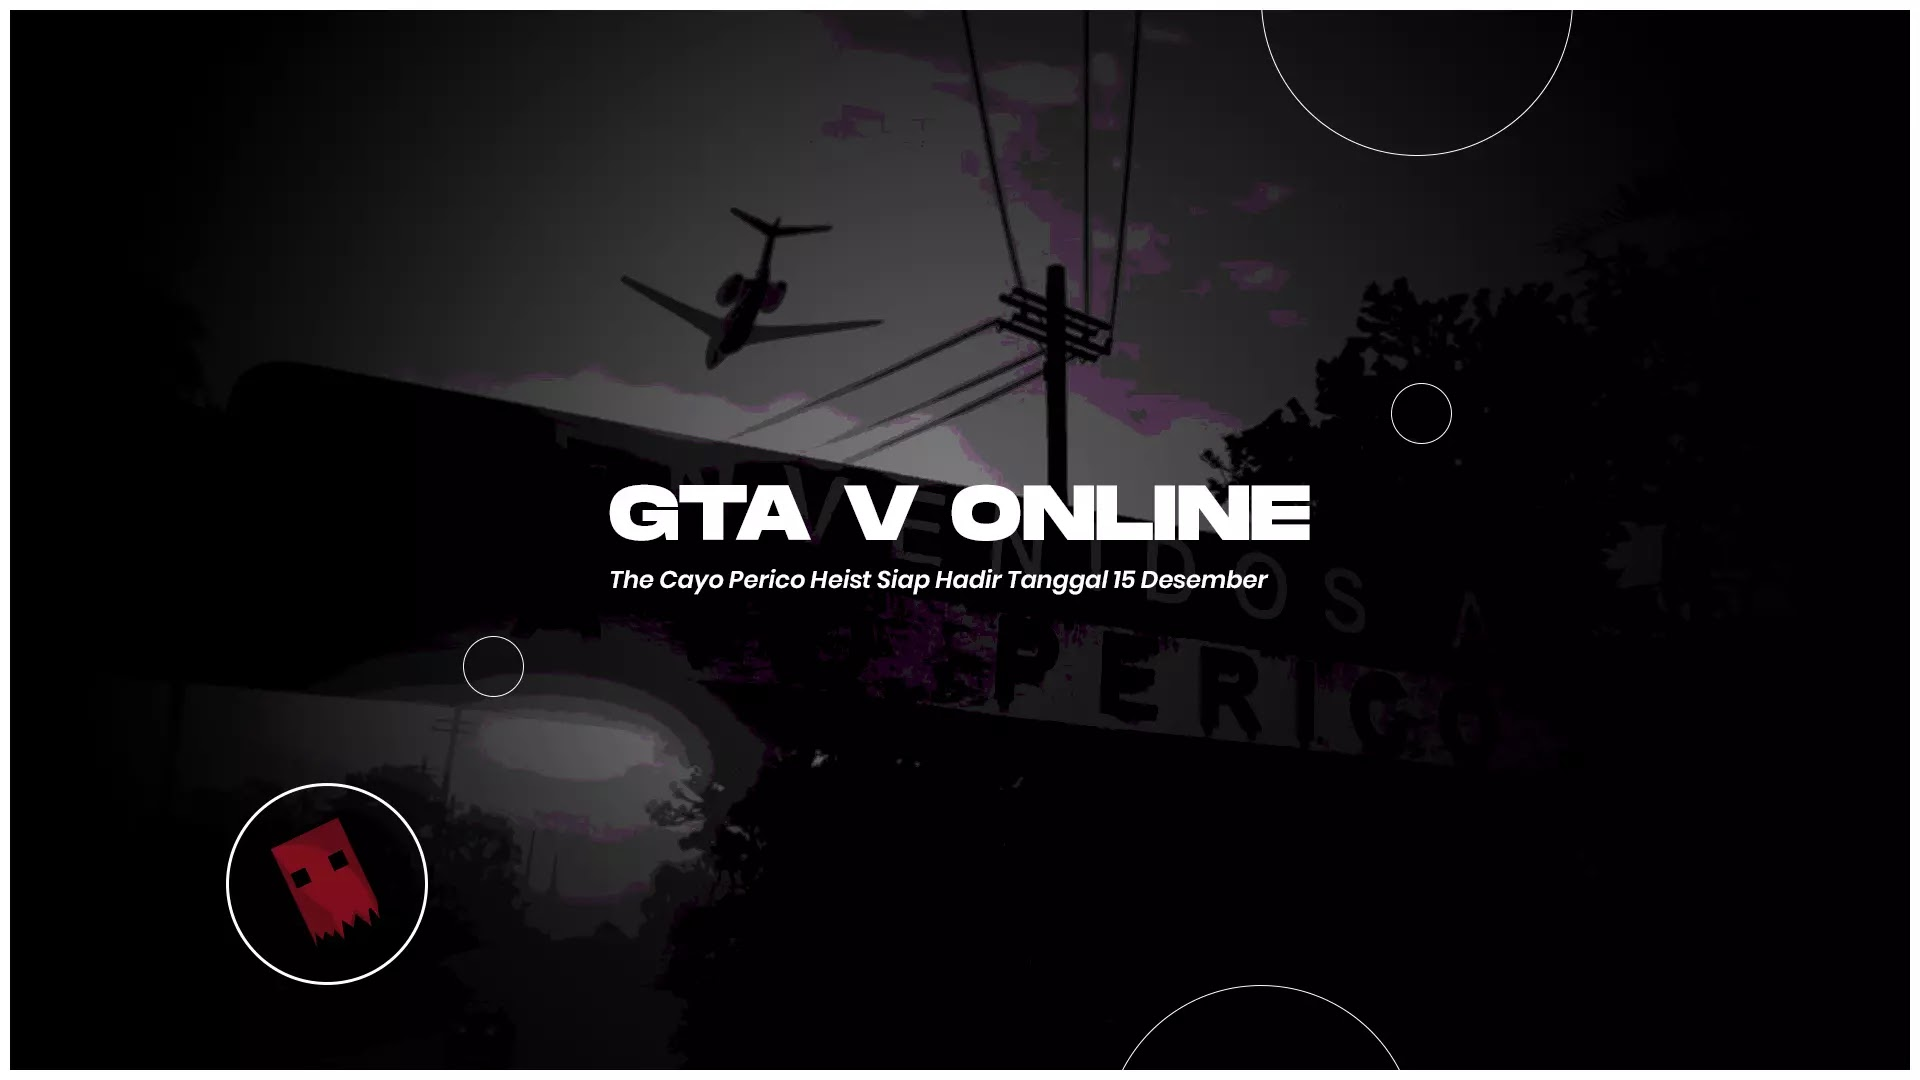 GTA V Online : The Cayo Perico Heist Siap Hadir Tanggal 15 Desember